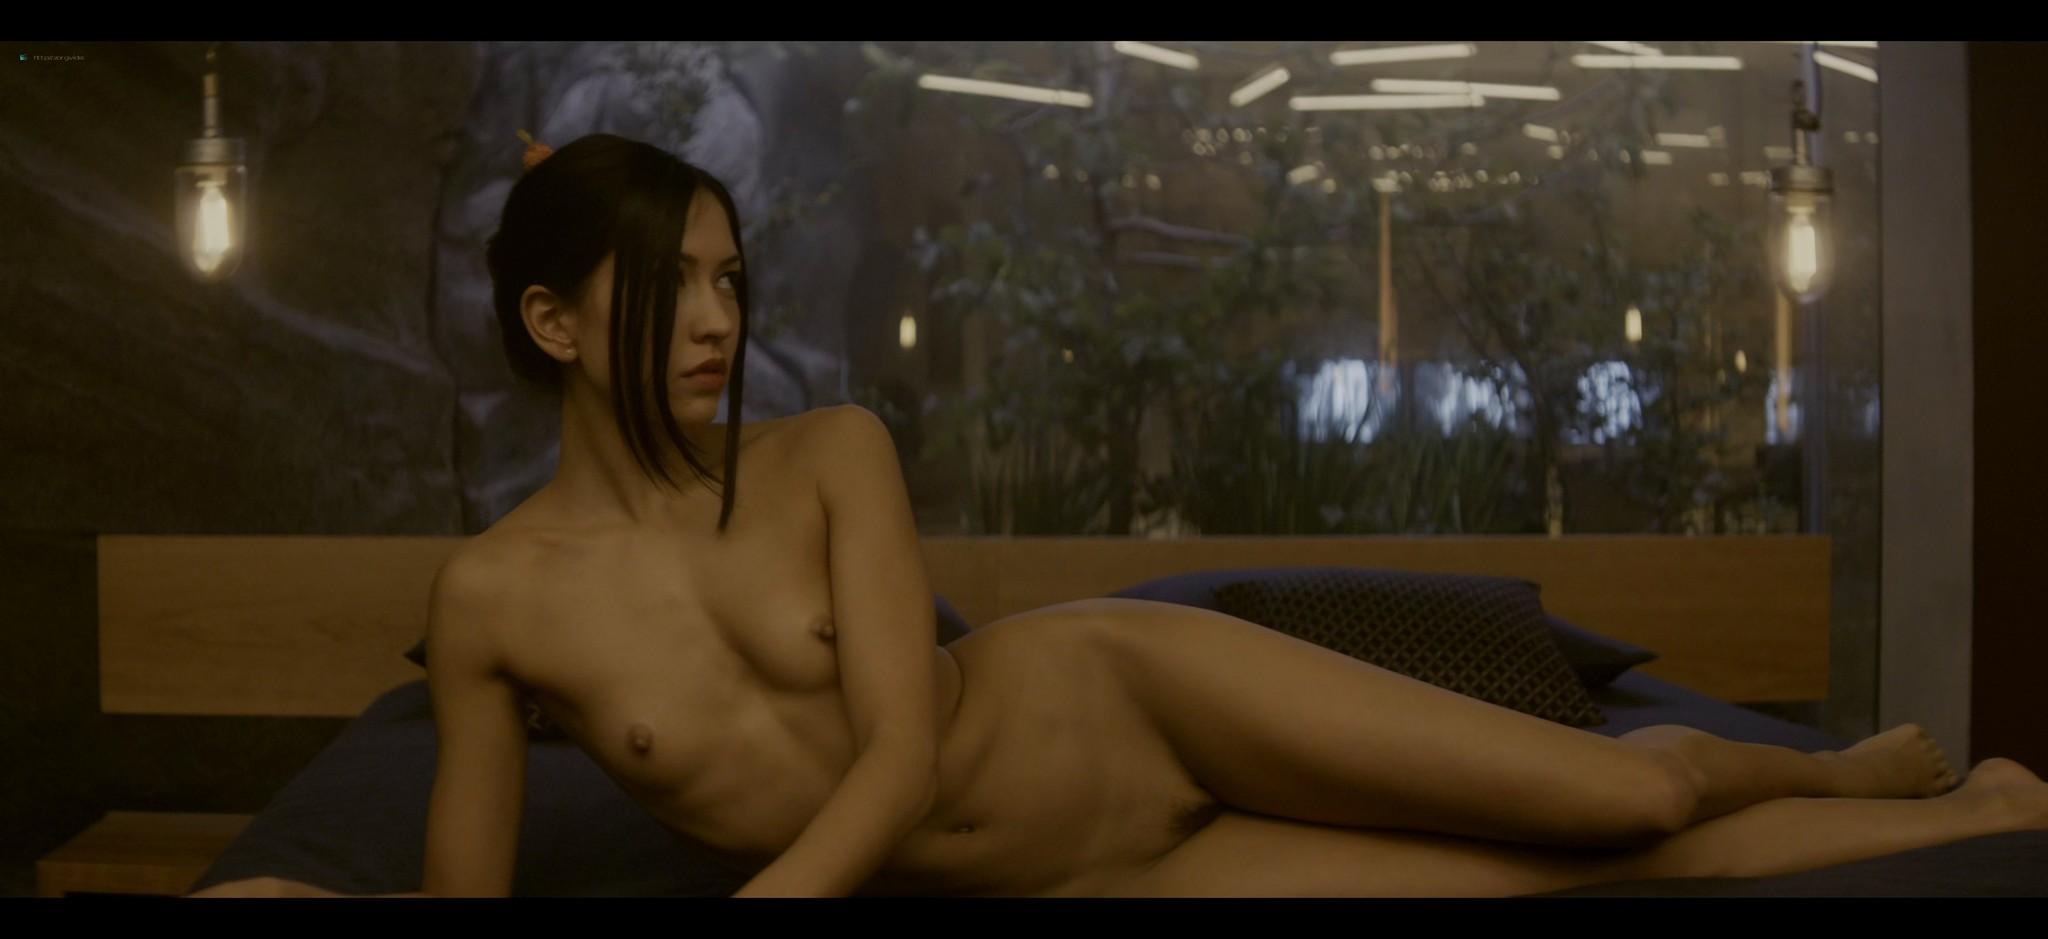 Alicia Vikander nude full frontal Sonoya Mizuno nude bush and others nude Ex Machina 2015 UHD 2160 1080p 009